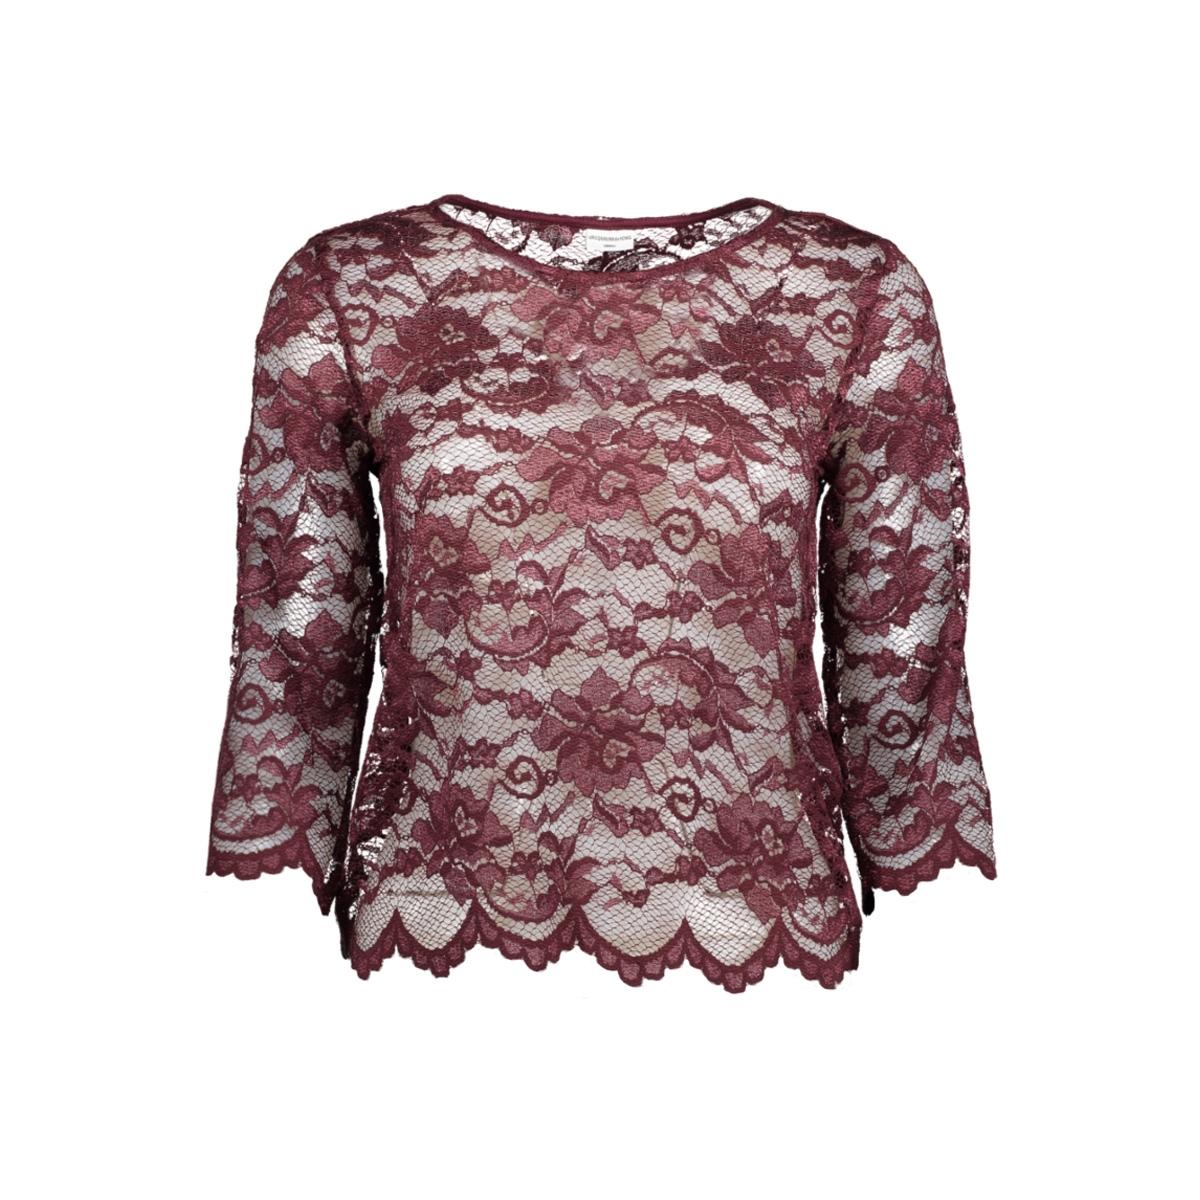 jdyadriana 3/4 top jrs 15137054 jacqueline de yong t-shirt vineyard wine